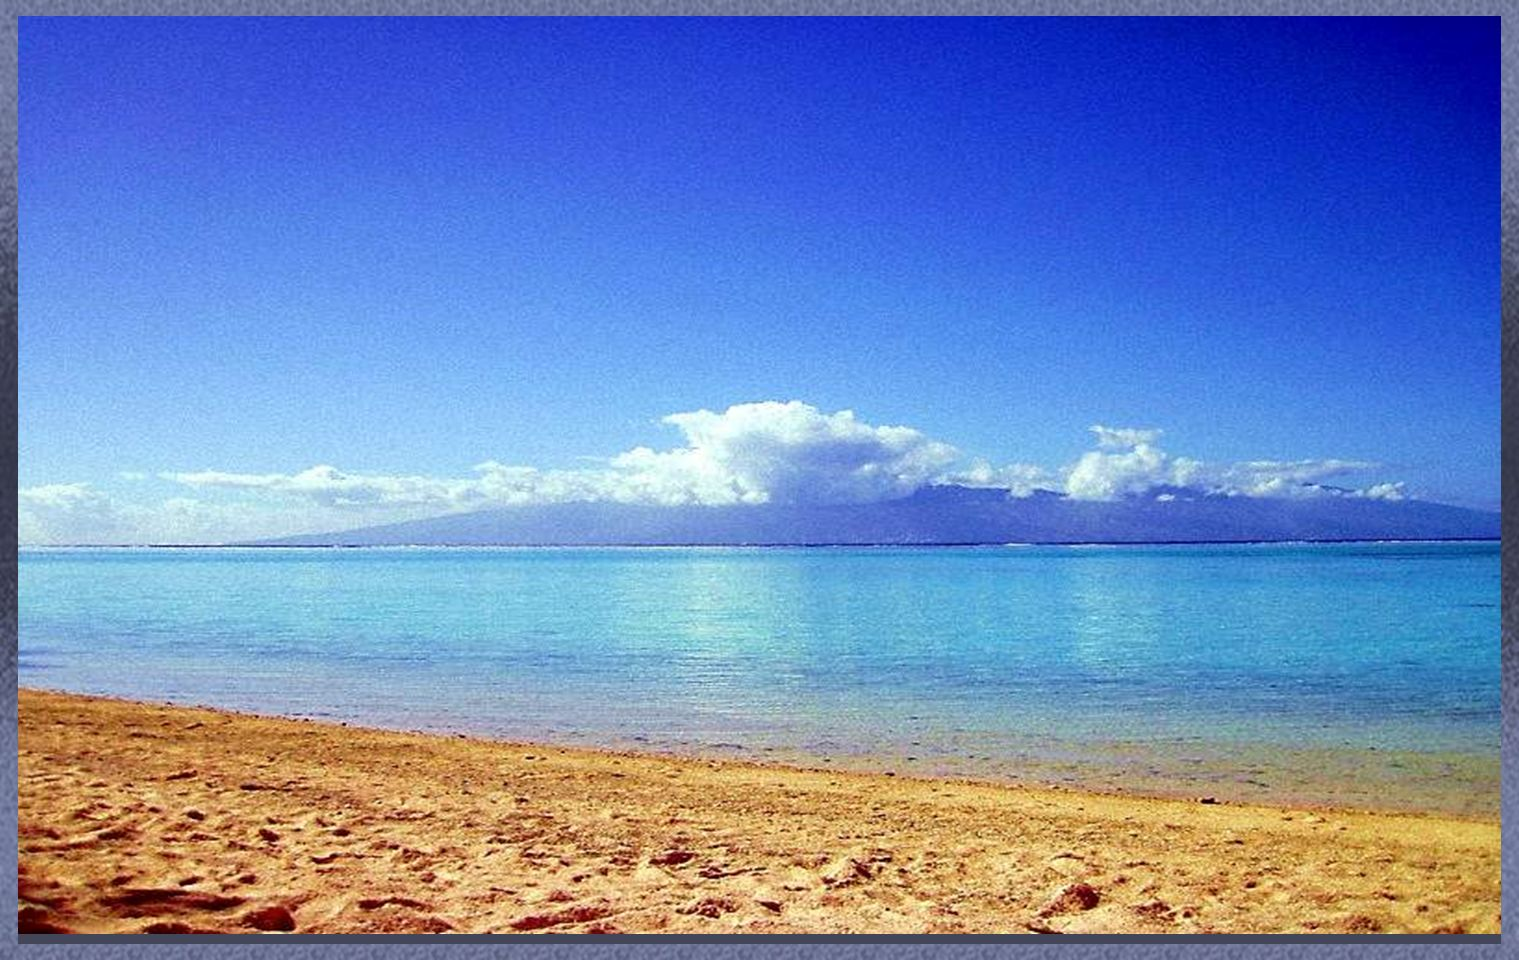 Esta Isla cubre un área de 136 km², con las mejores playas This Island covers a 136 km area ², with the best beaches MOOREA